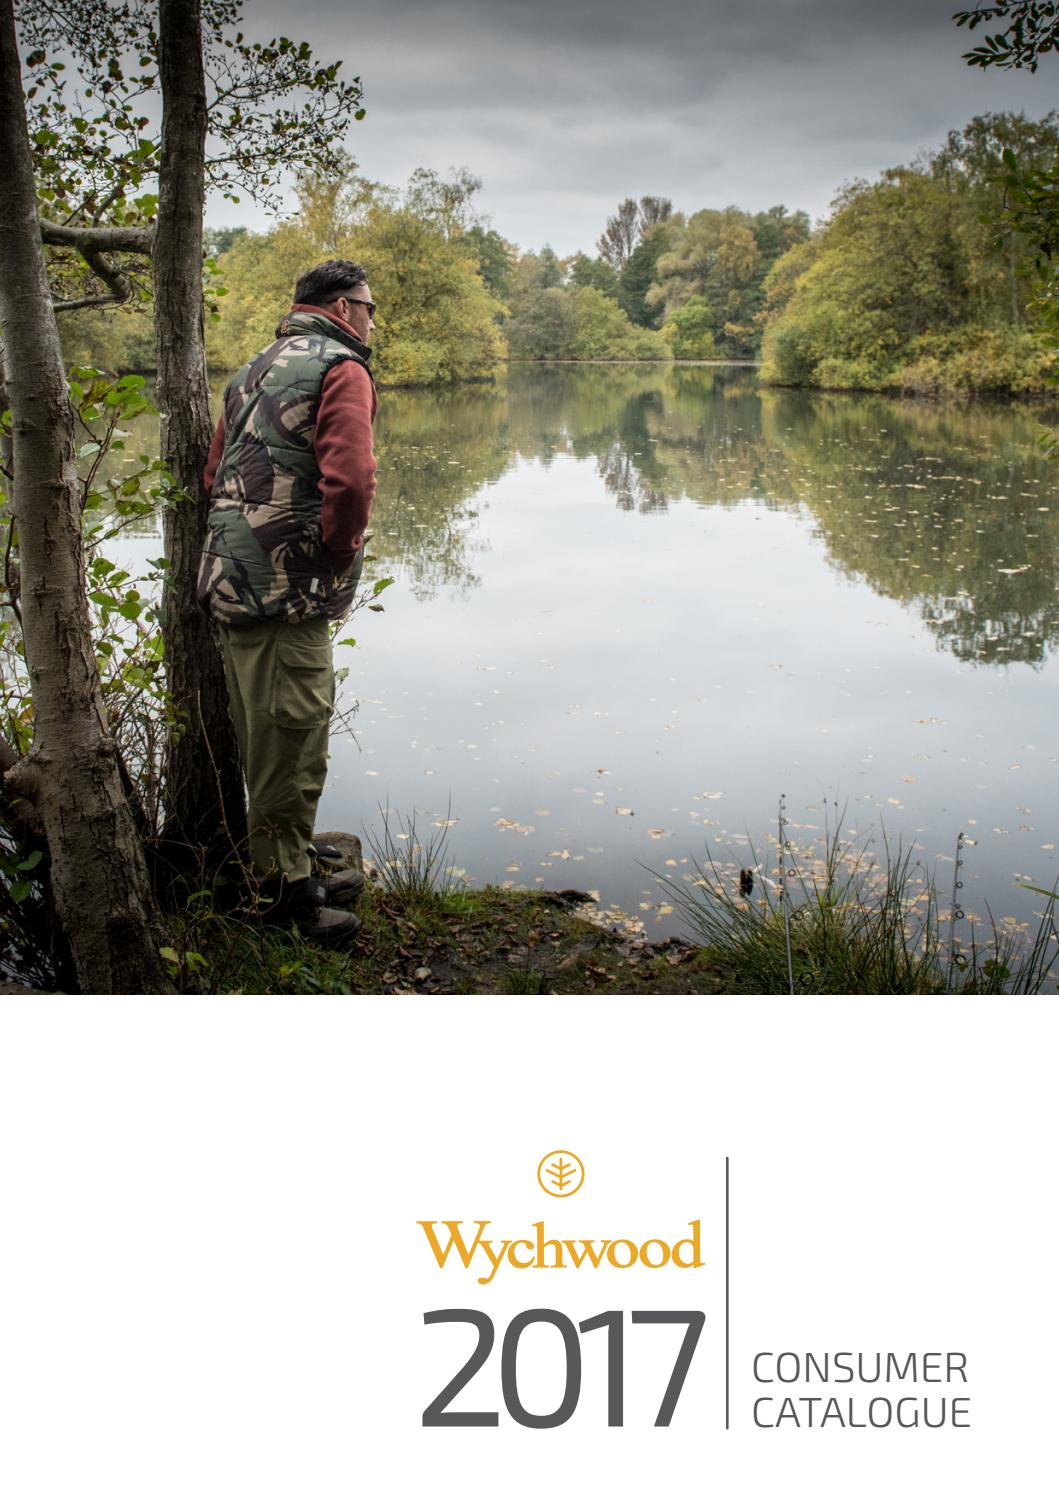 Wychwood Carp Fishing Carpers 2 Cup Kettle 0.8L